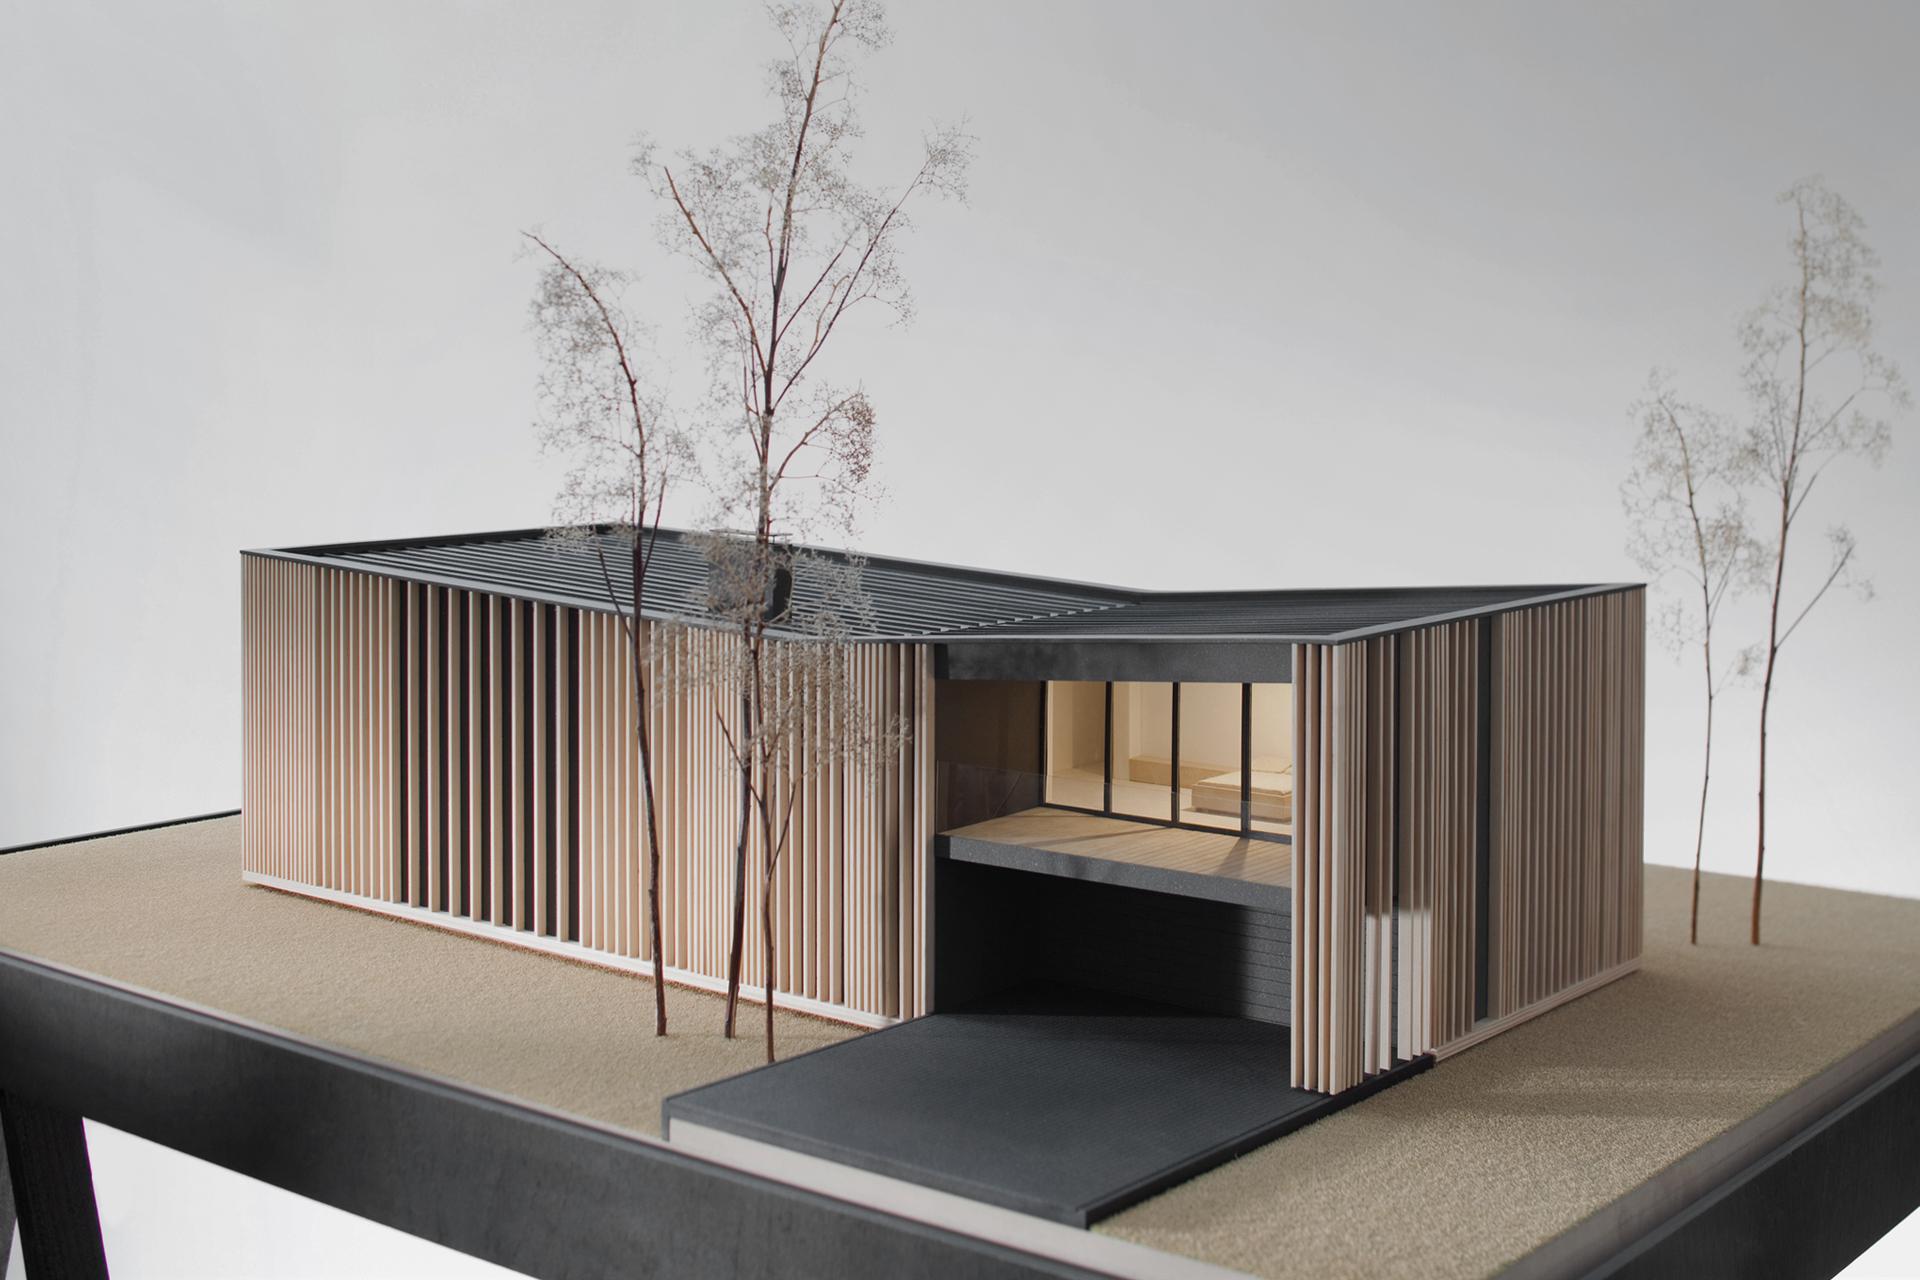 onimo-makiety-architektoniczne-PAG-shutter-05